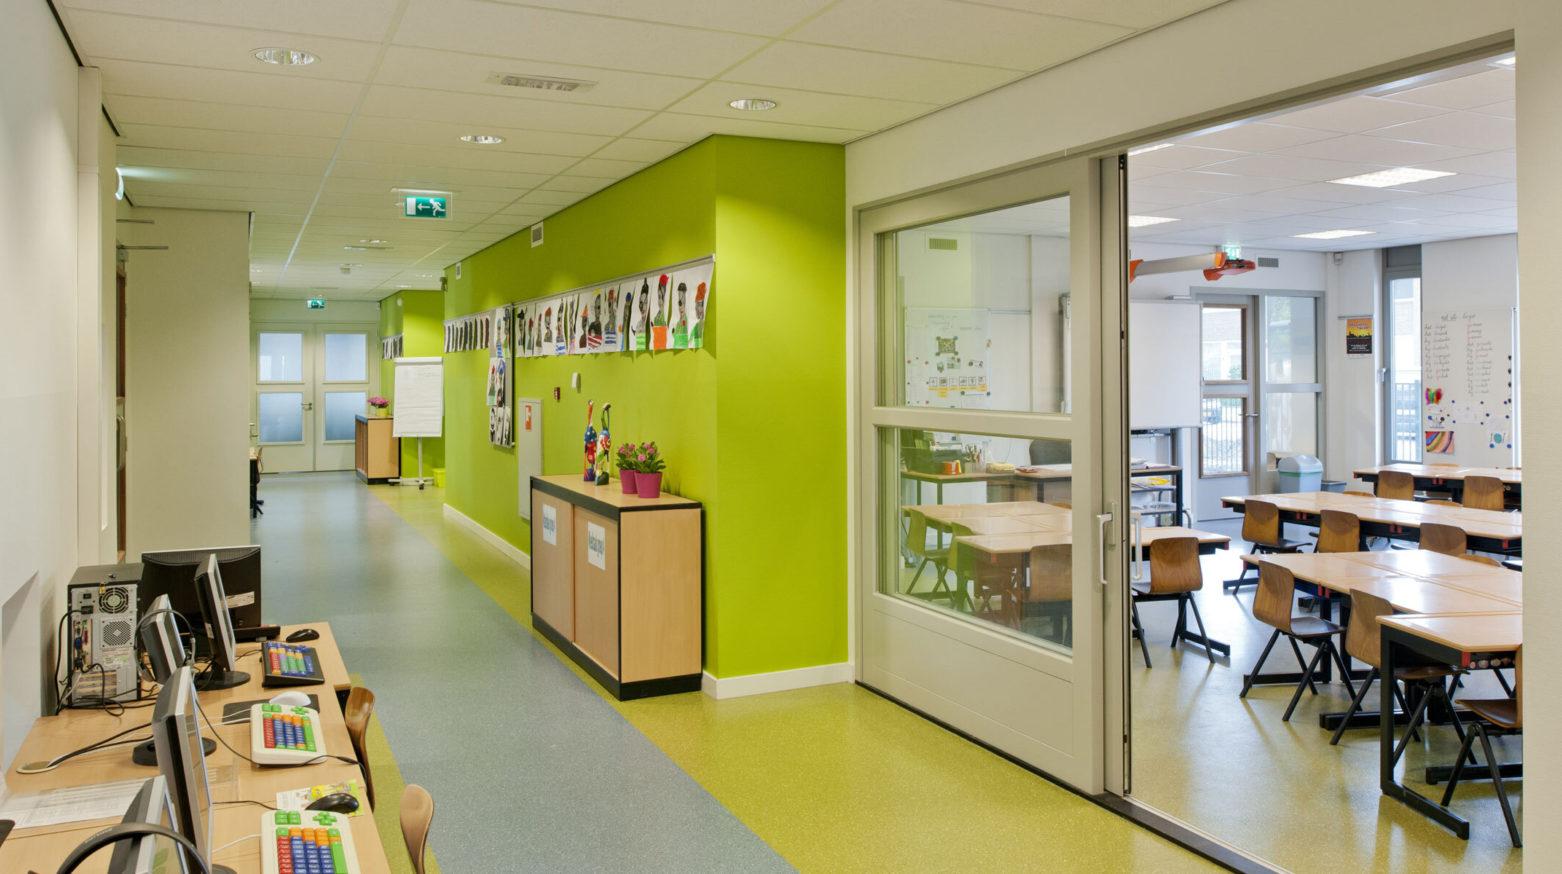 Kindcentrum oirschot 05